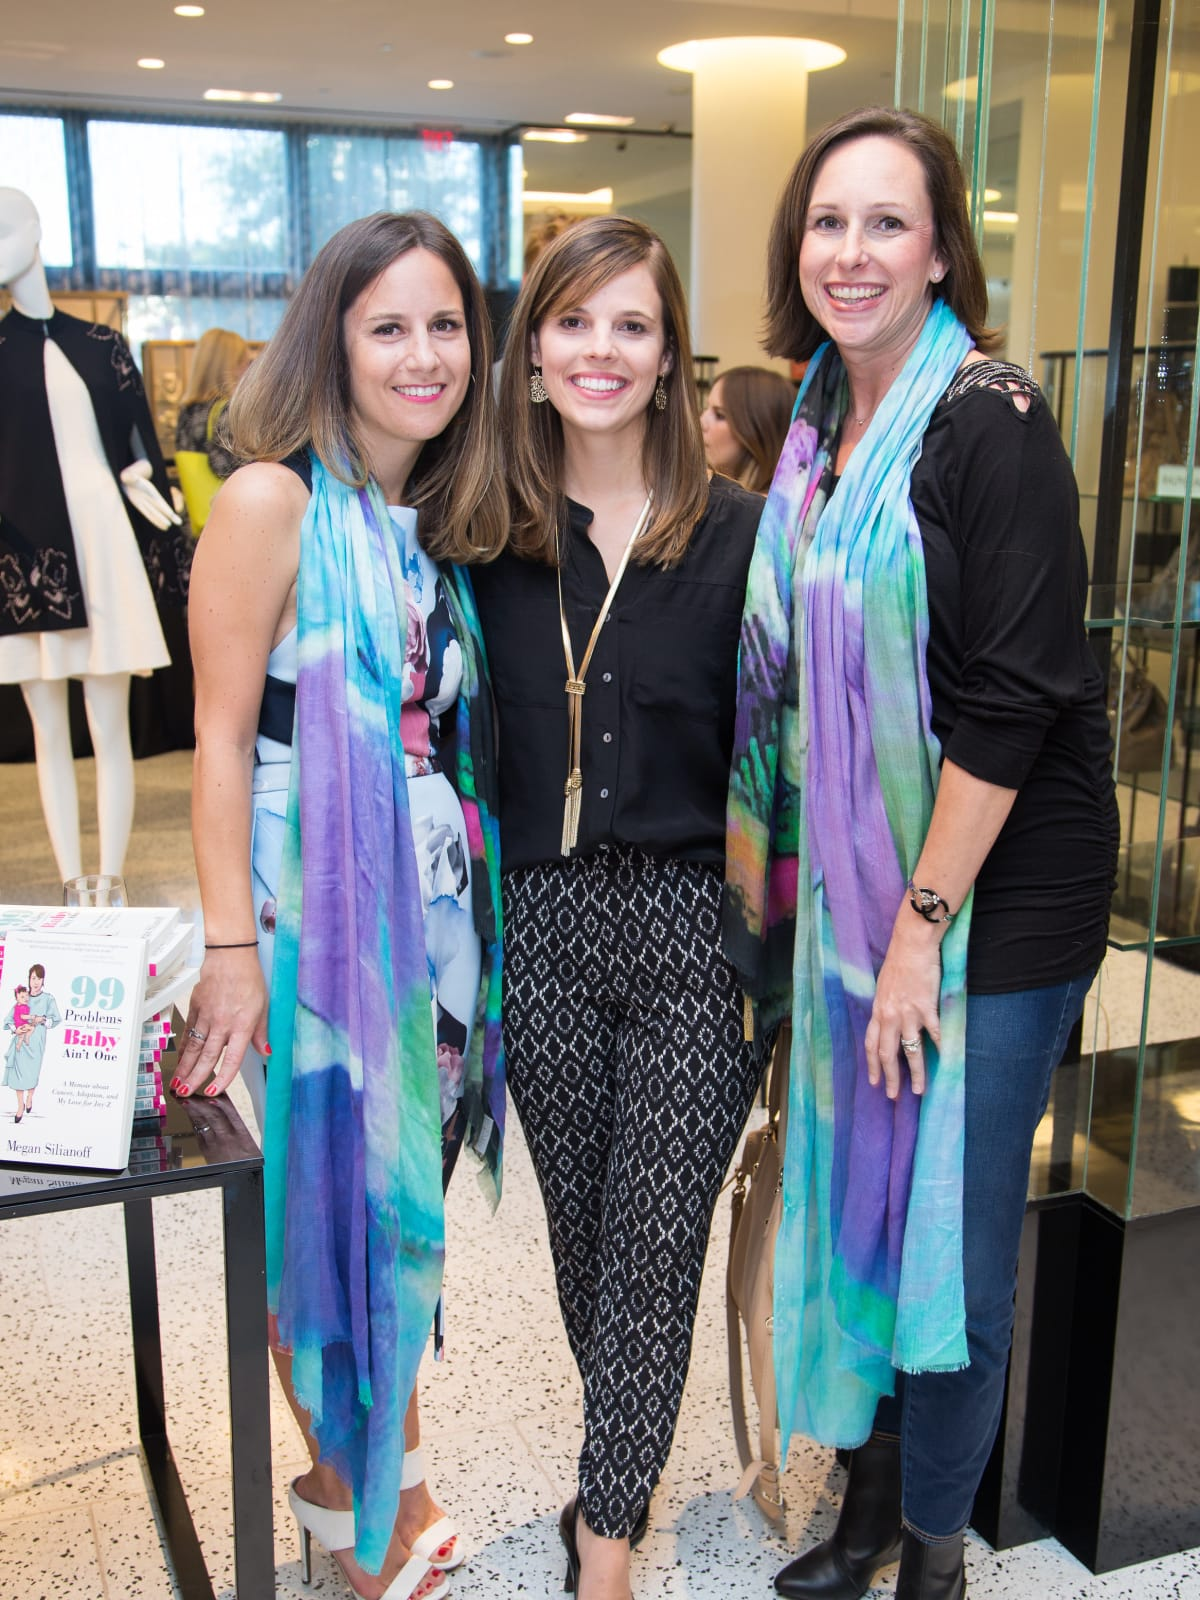 News, Shelby, Ovarian Cancer Awareness Month. tootsies, Sept. 2015, Megan Silanoff, Morgan Hotzel, Aimee Friend